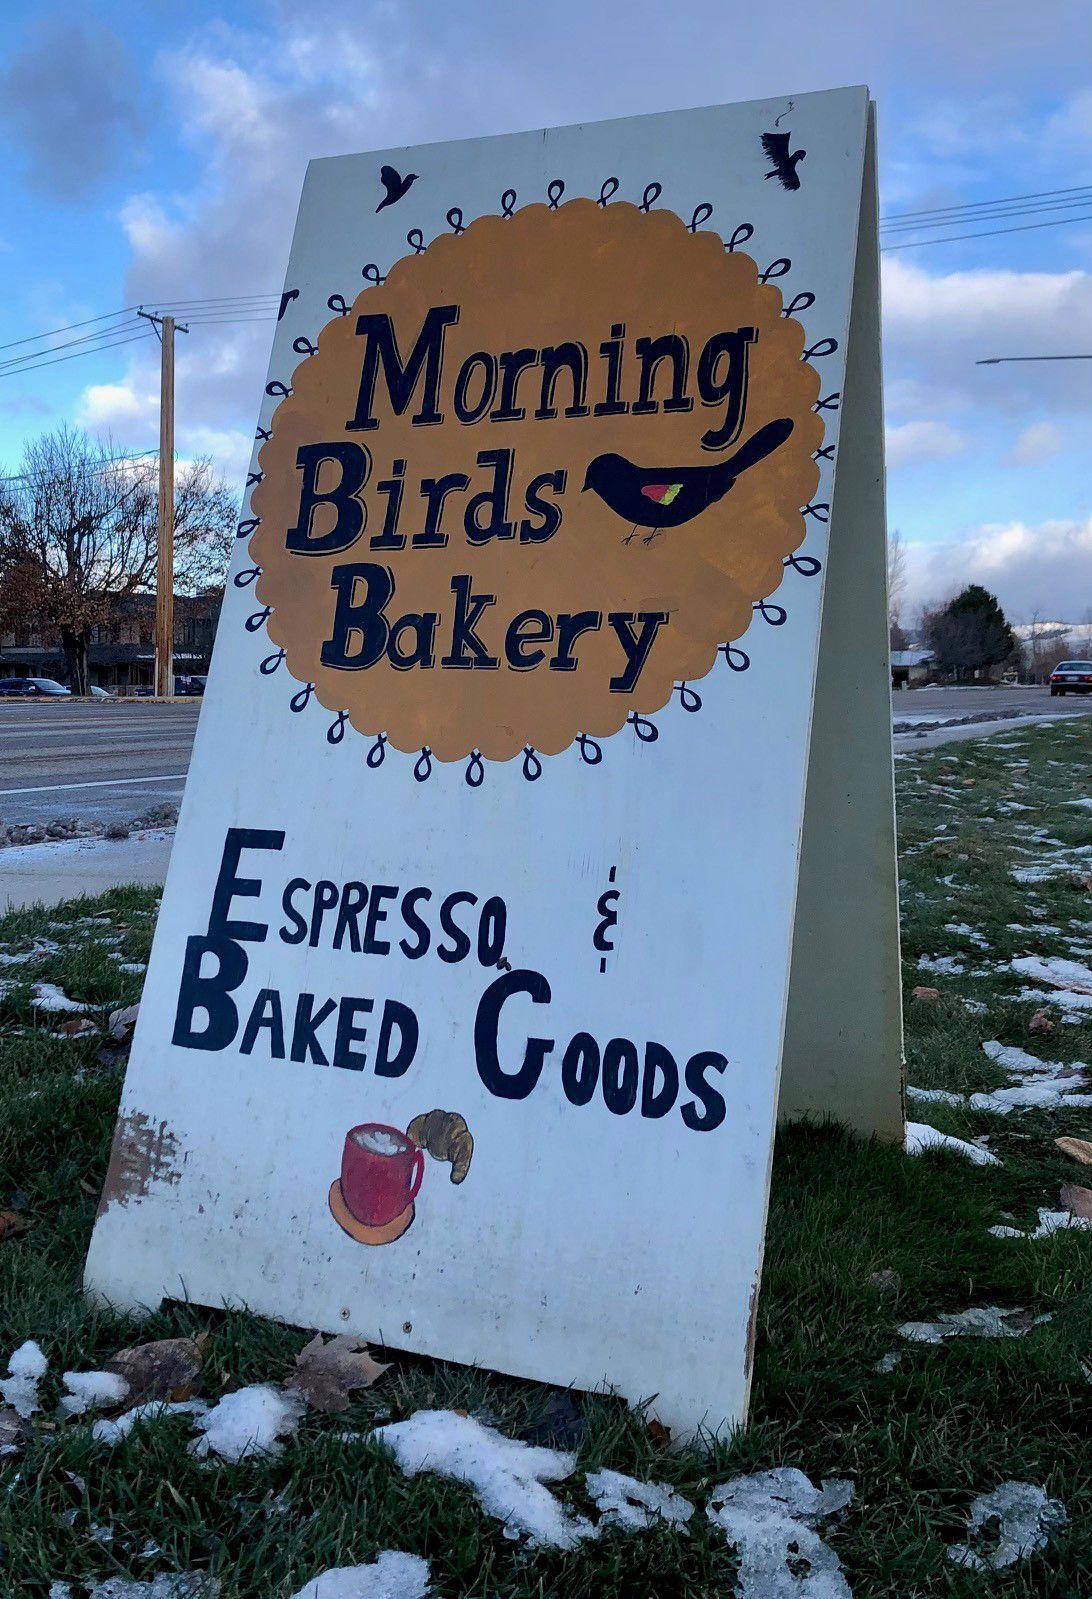 Morning Birds Bakery